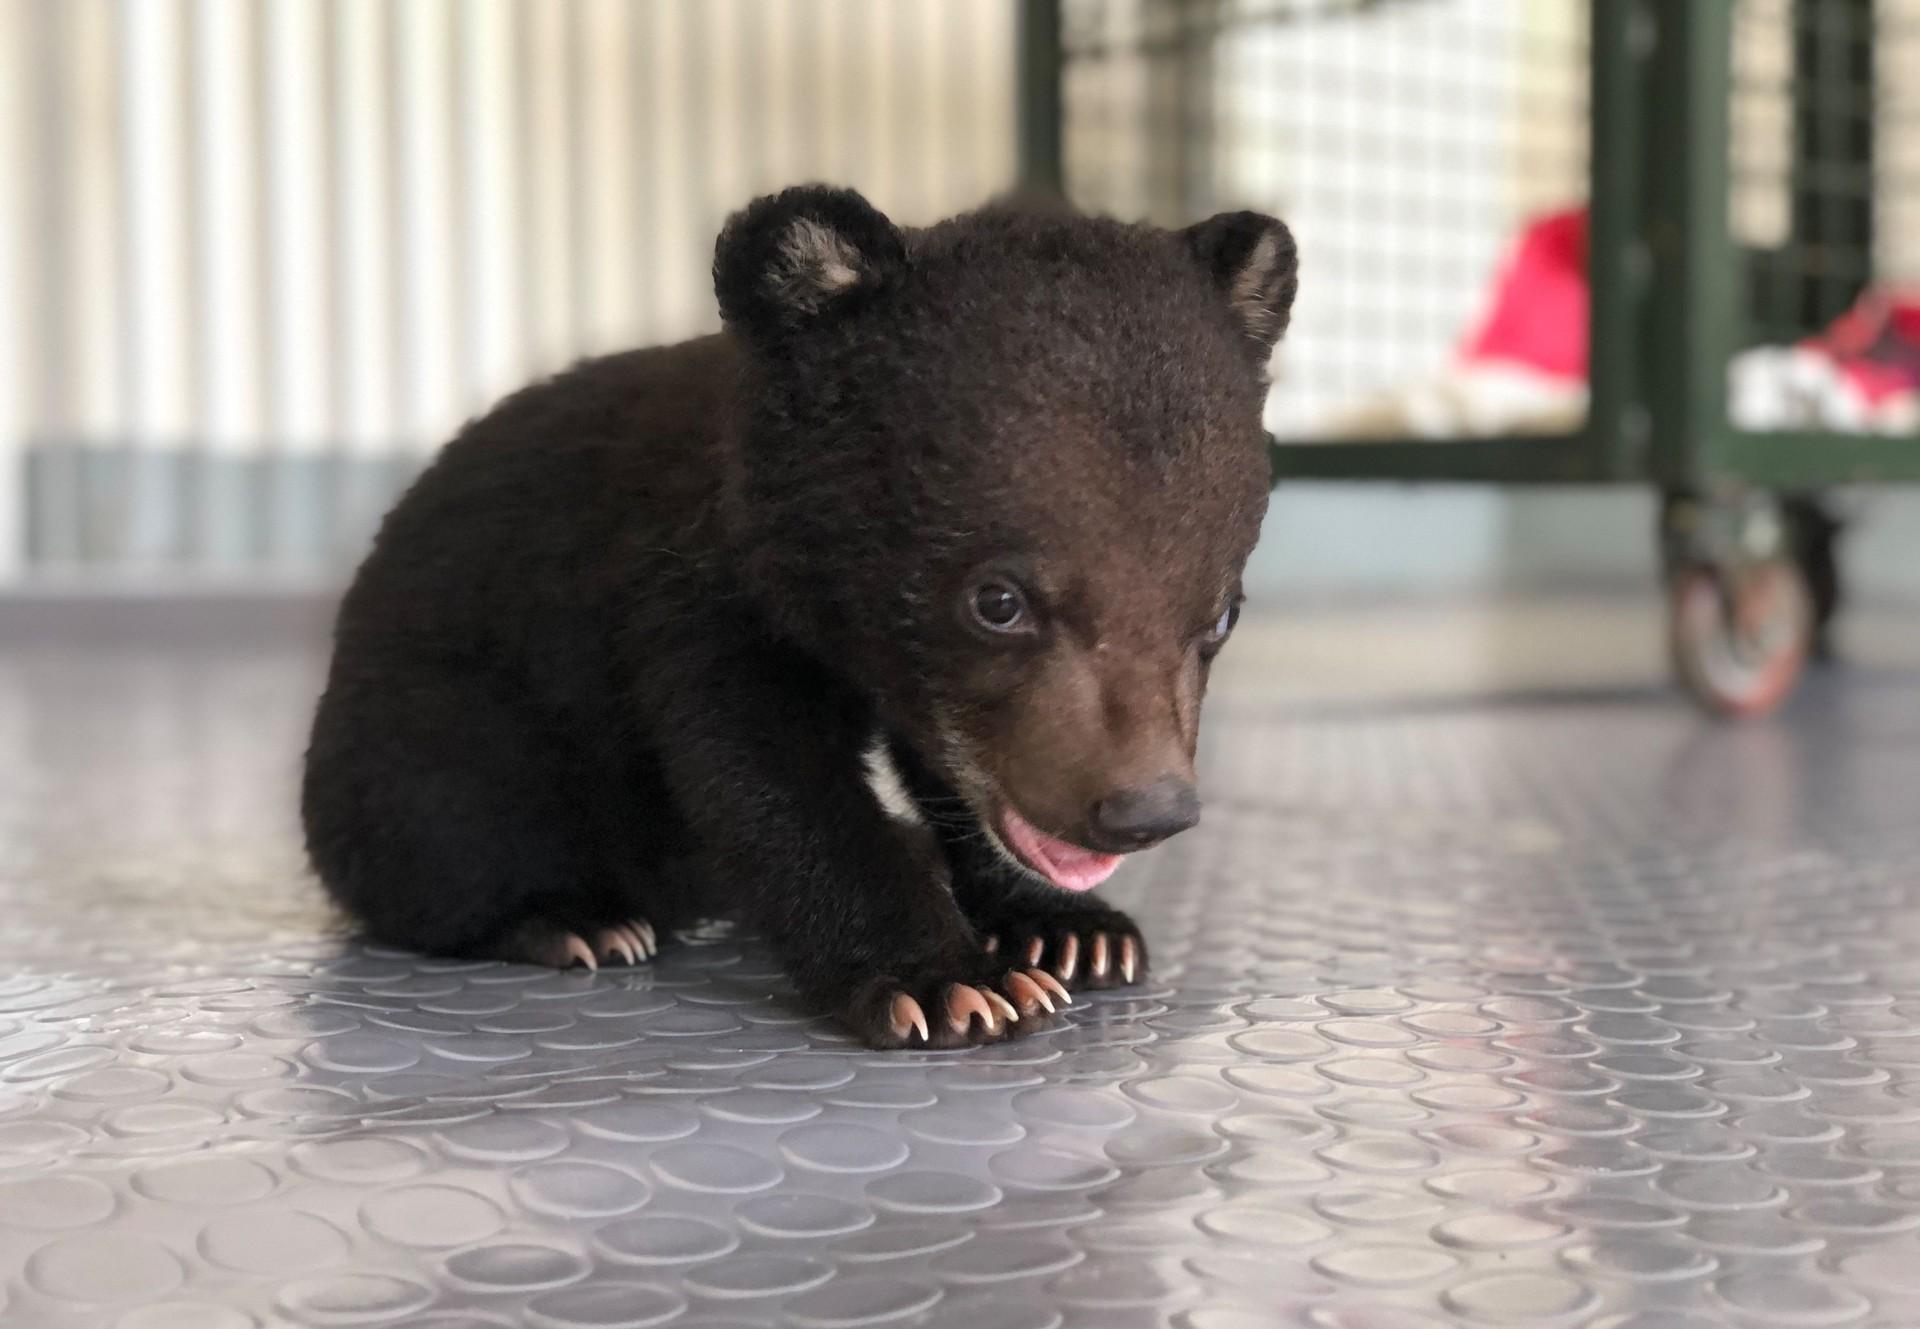 Cub Mochi finds a species-appropriate home at BEAR SANCTUARY Ninh Binh